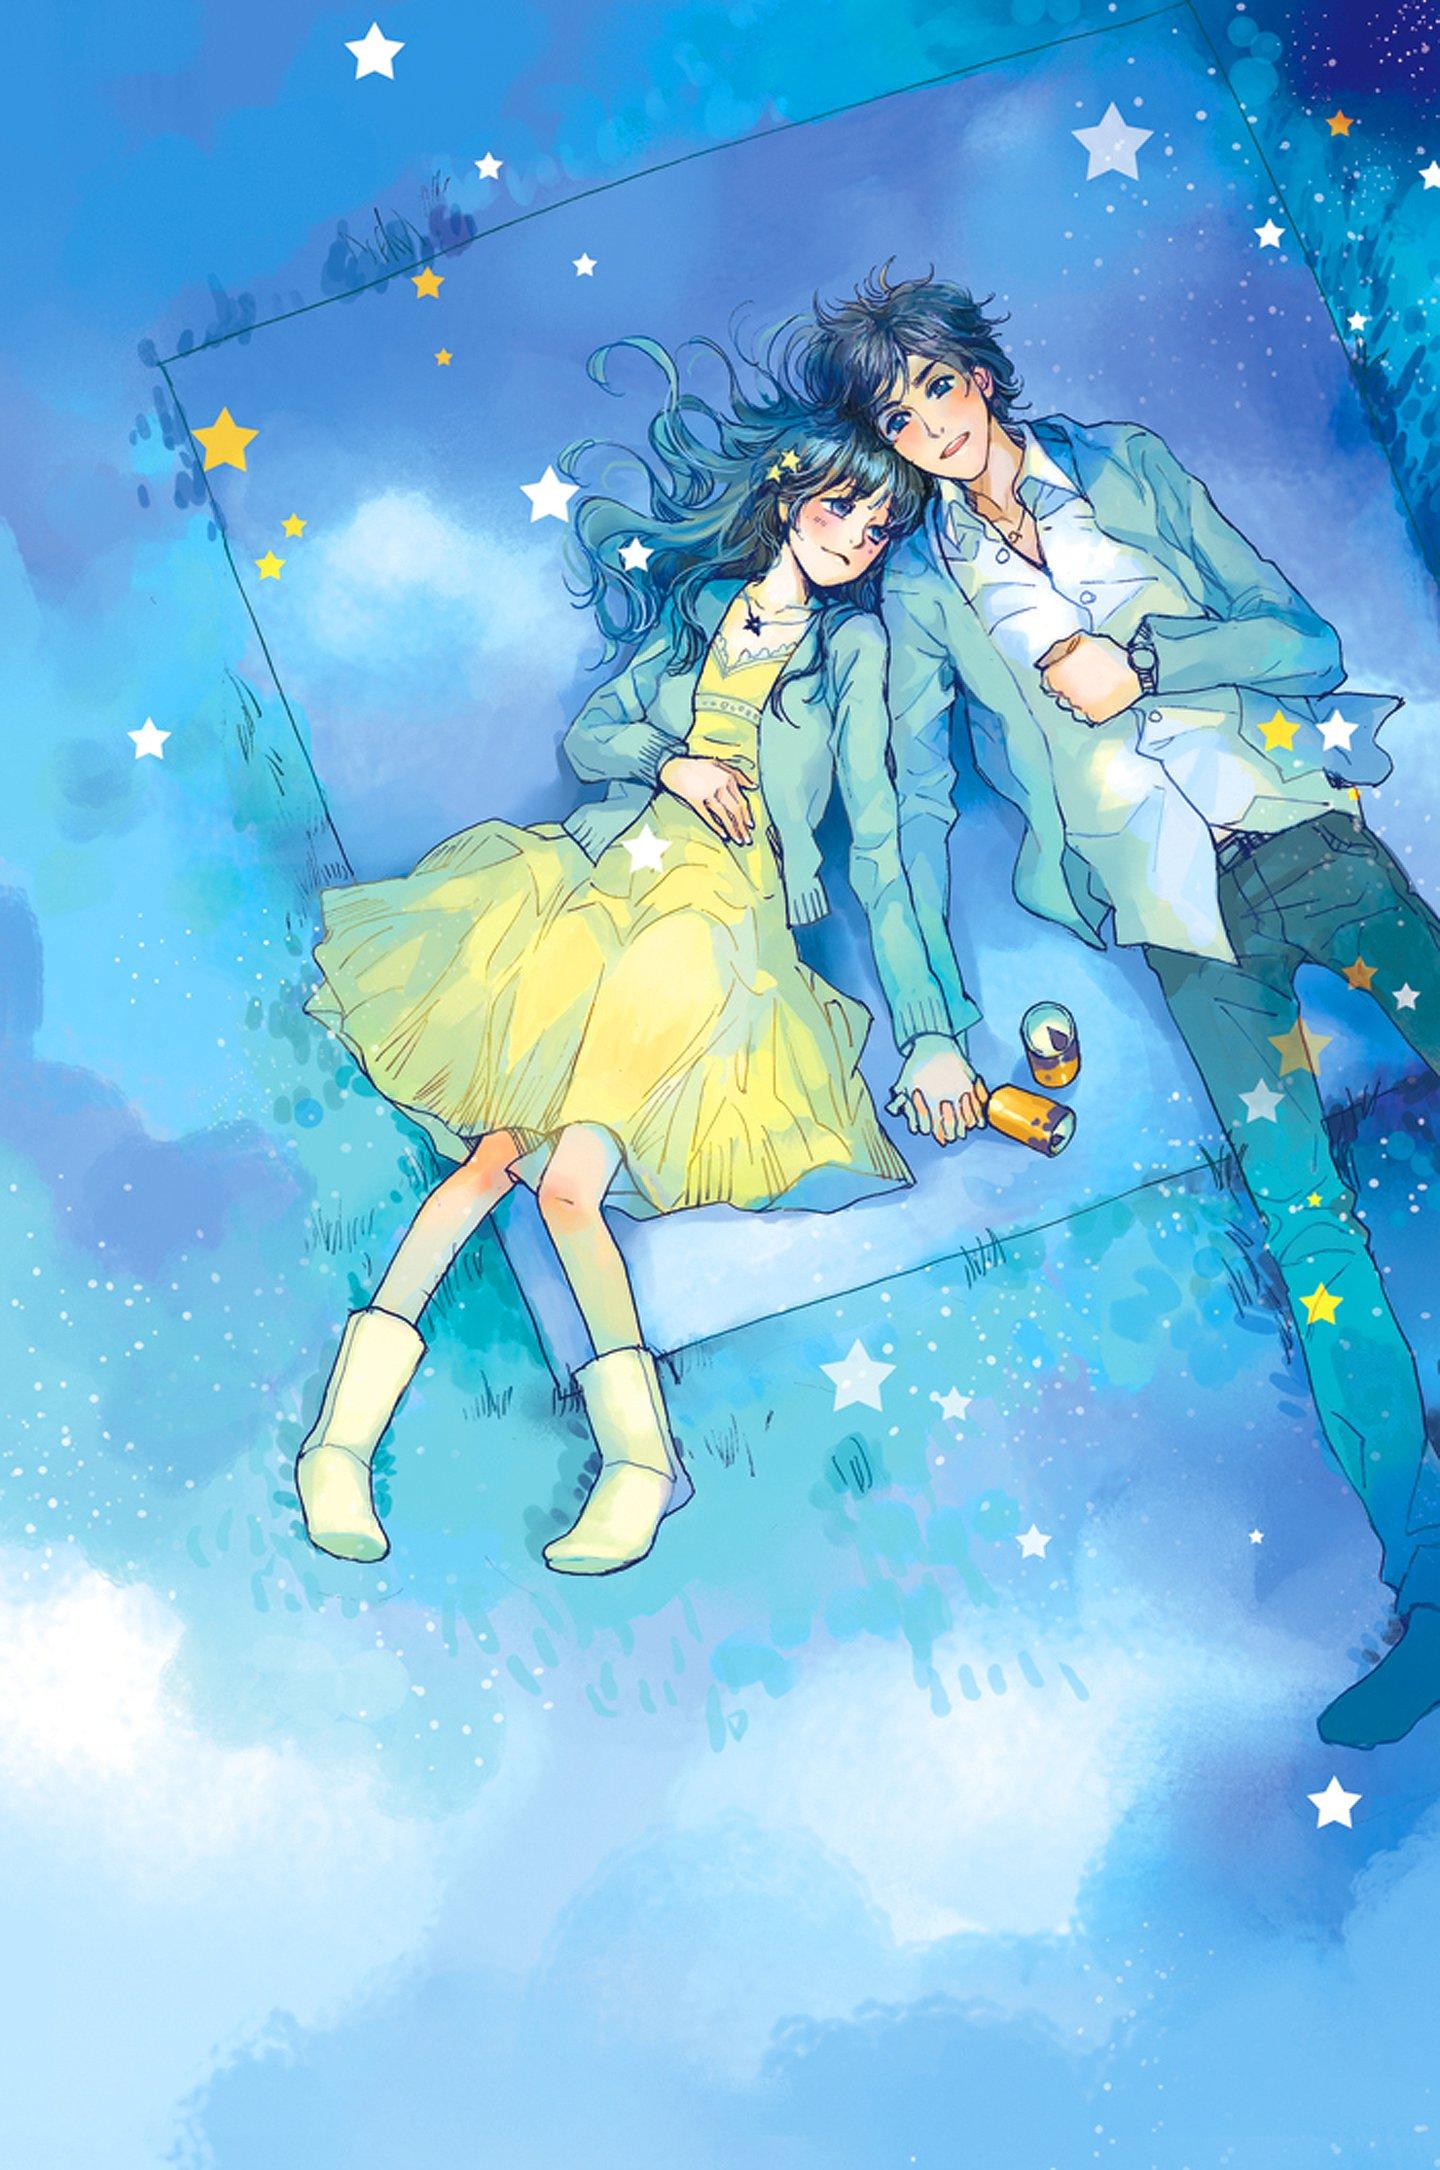 Small Cute Boy Wallpaper Anime Couple Yellow Dress Boy Love Stars Romantic Blue Sky